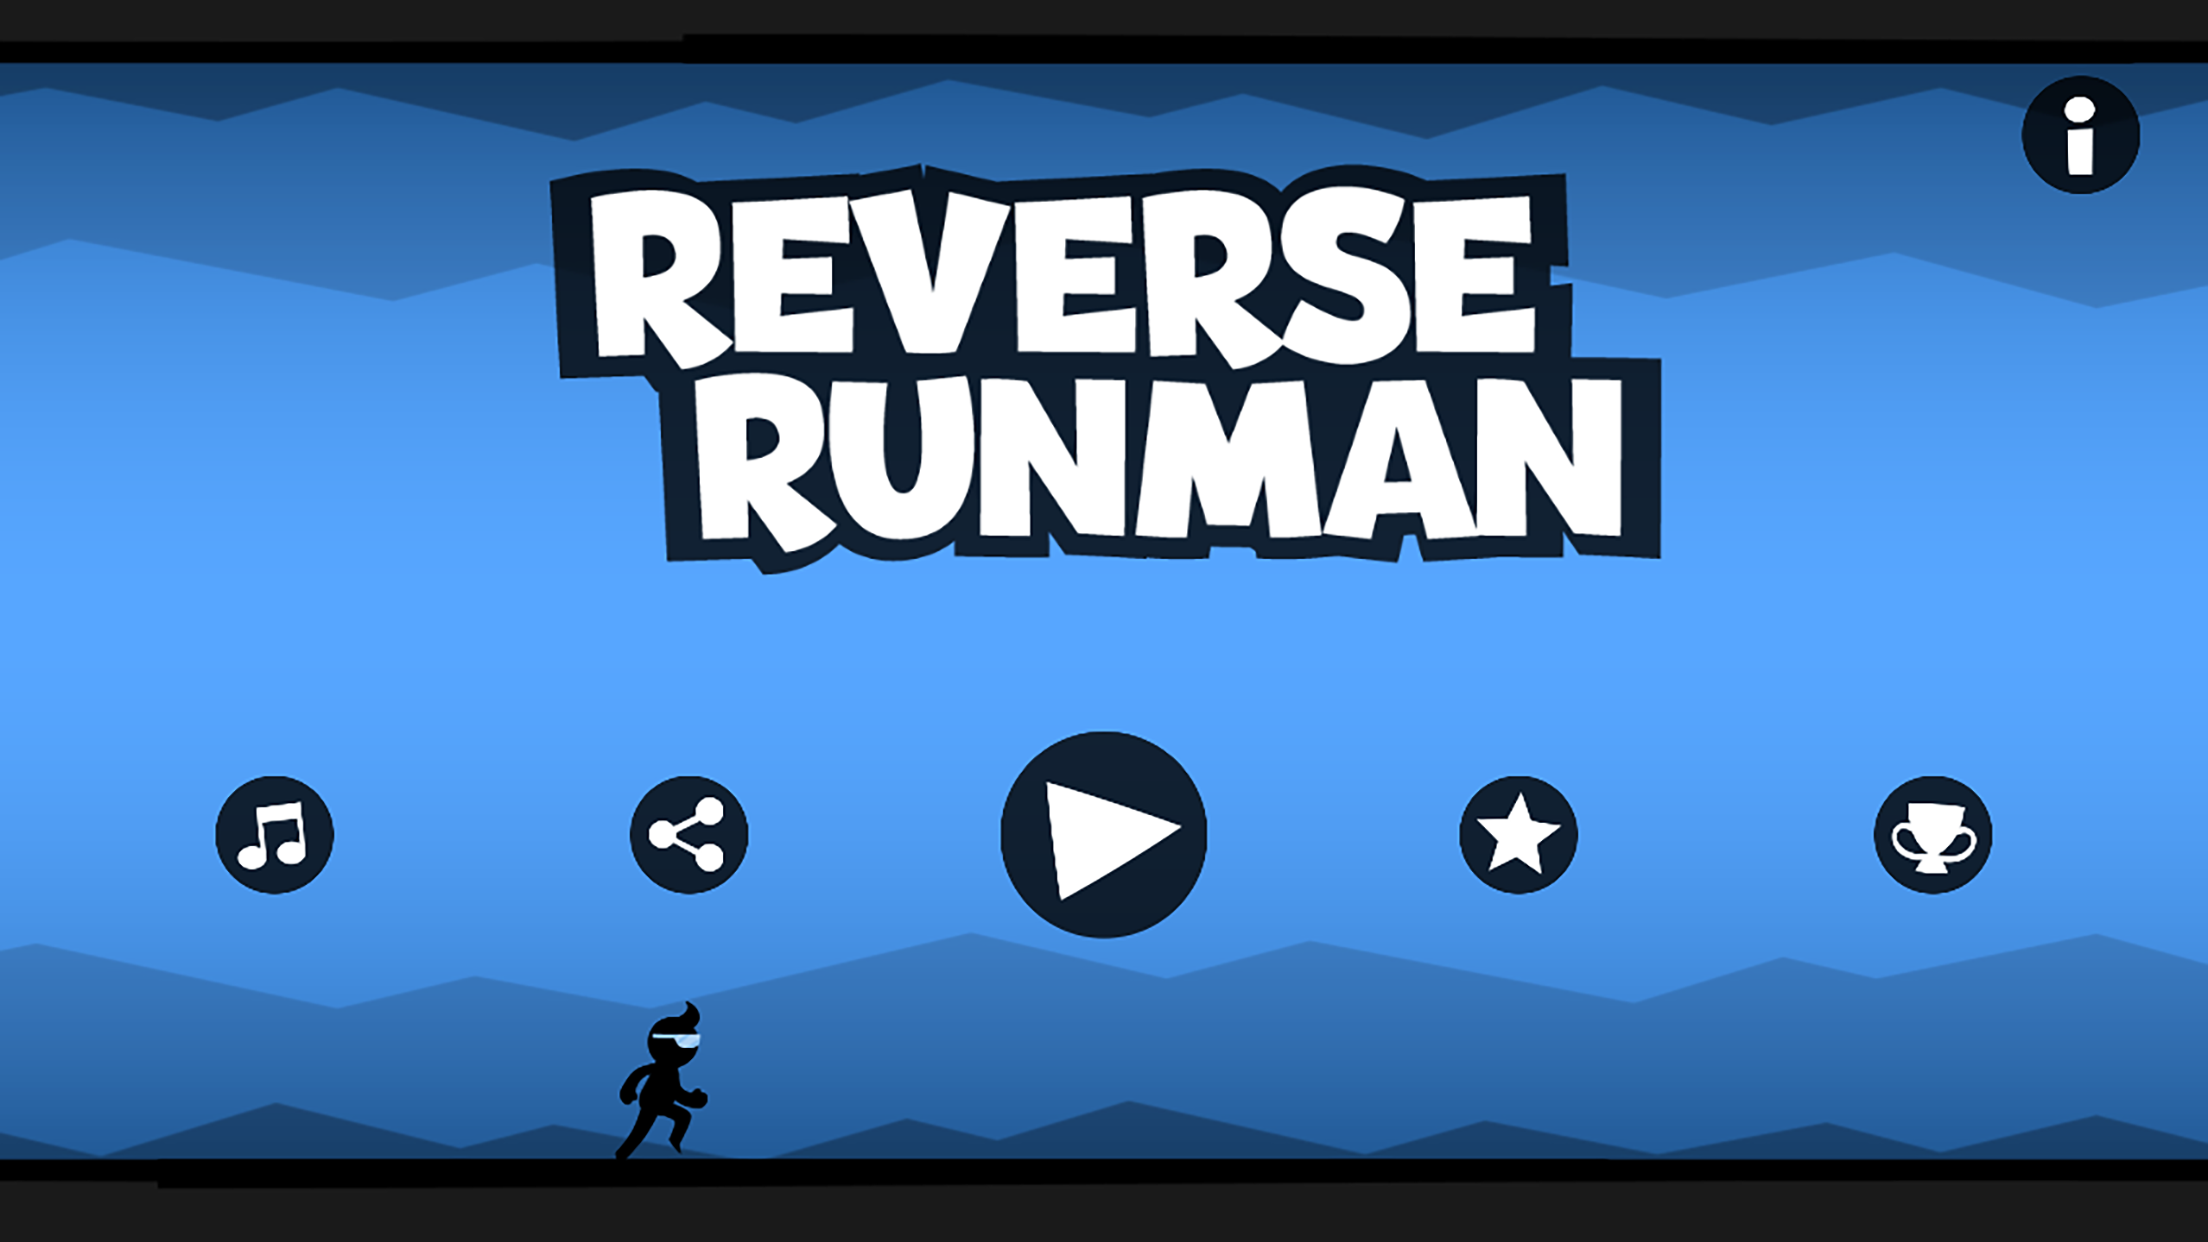 Reverse Runman